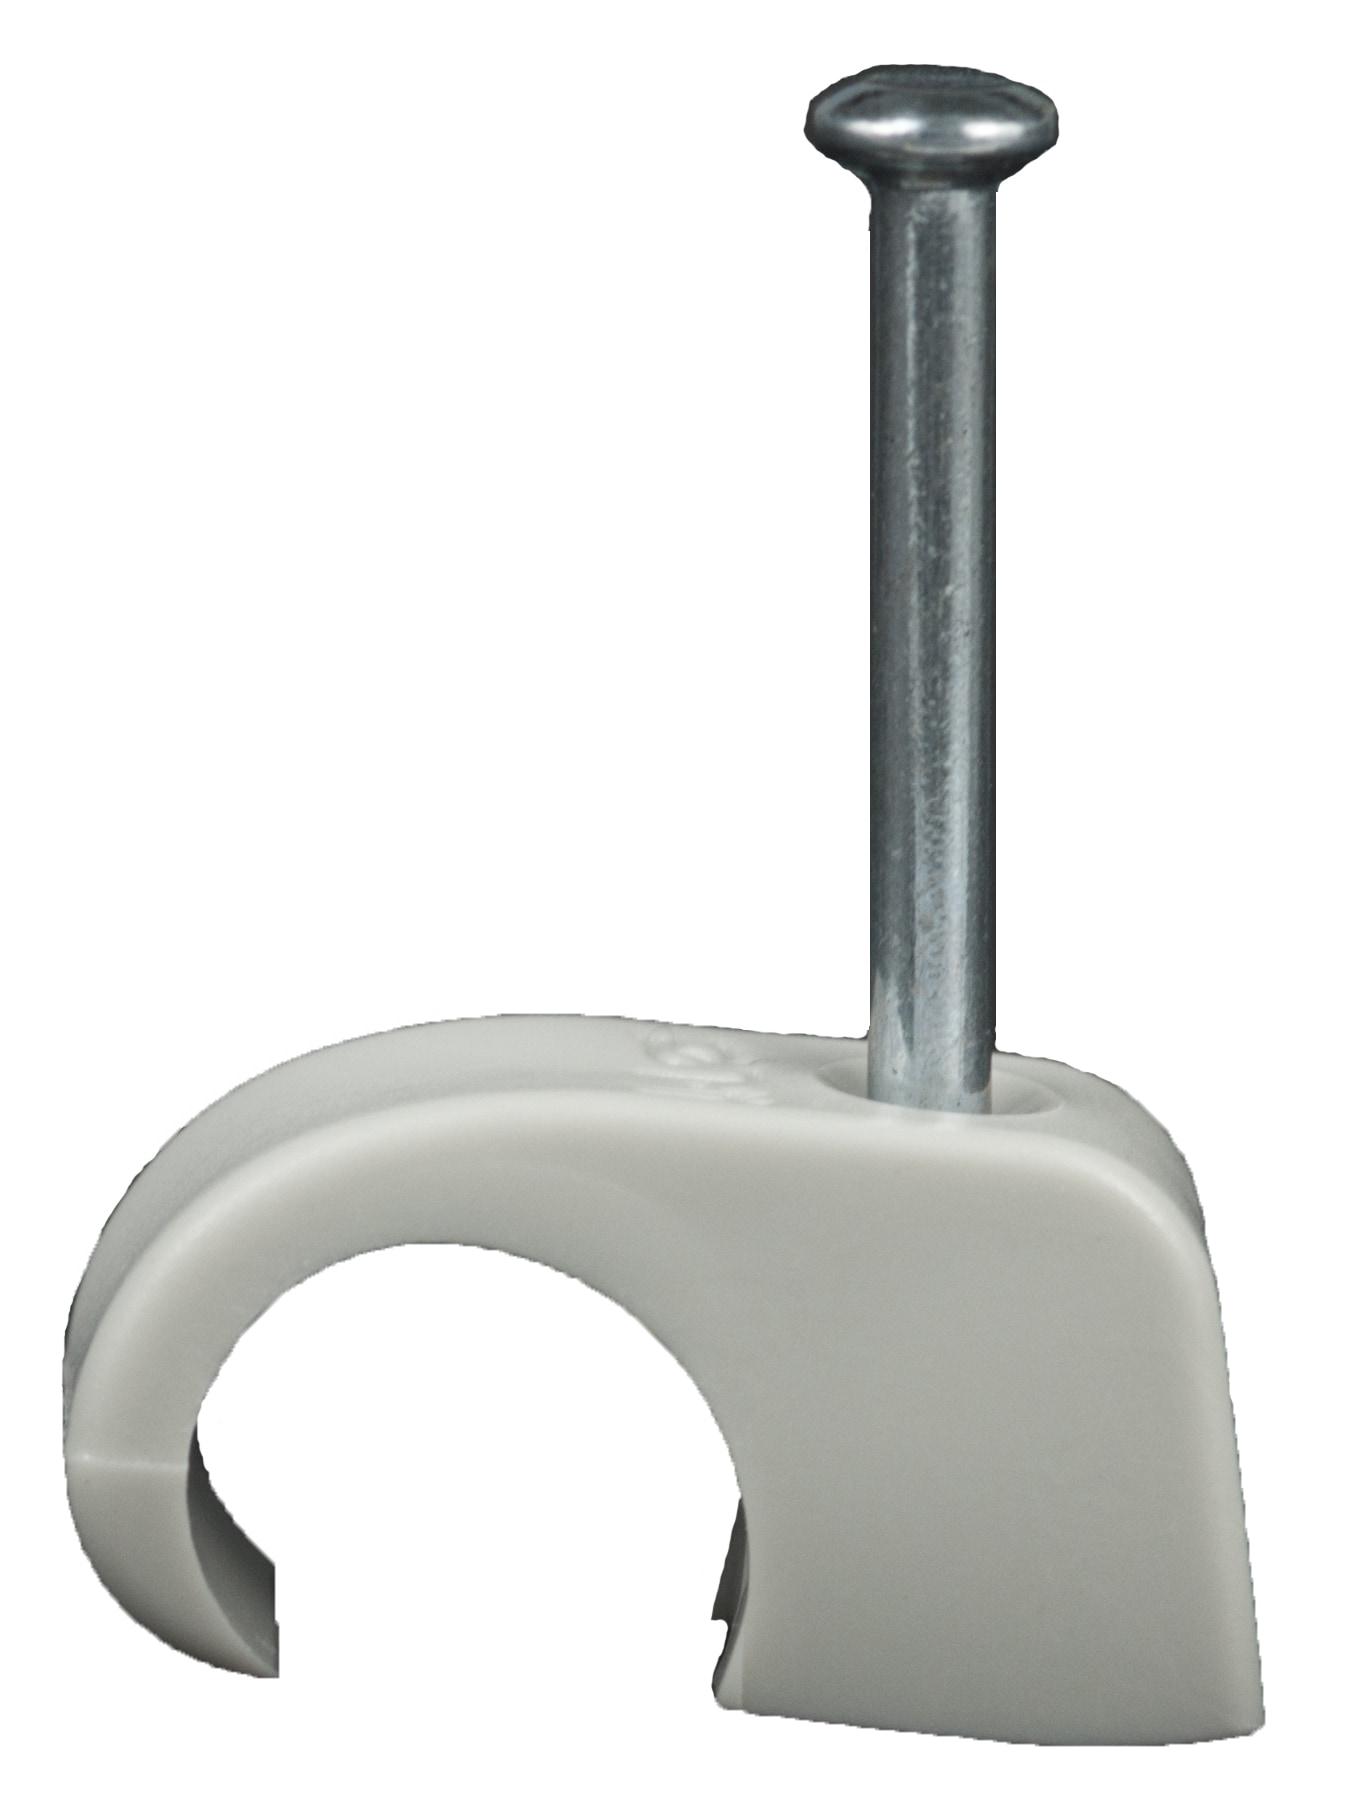 Don Q. Nagelschelle 2x25 7-11mm grau WKK PE VPE100 #903818